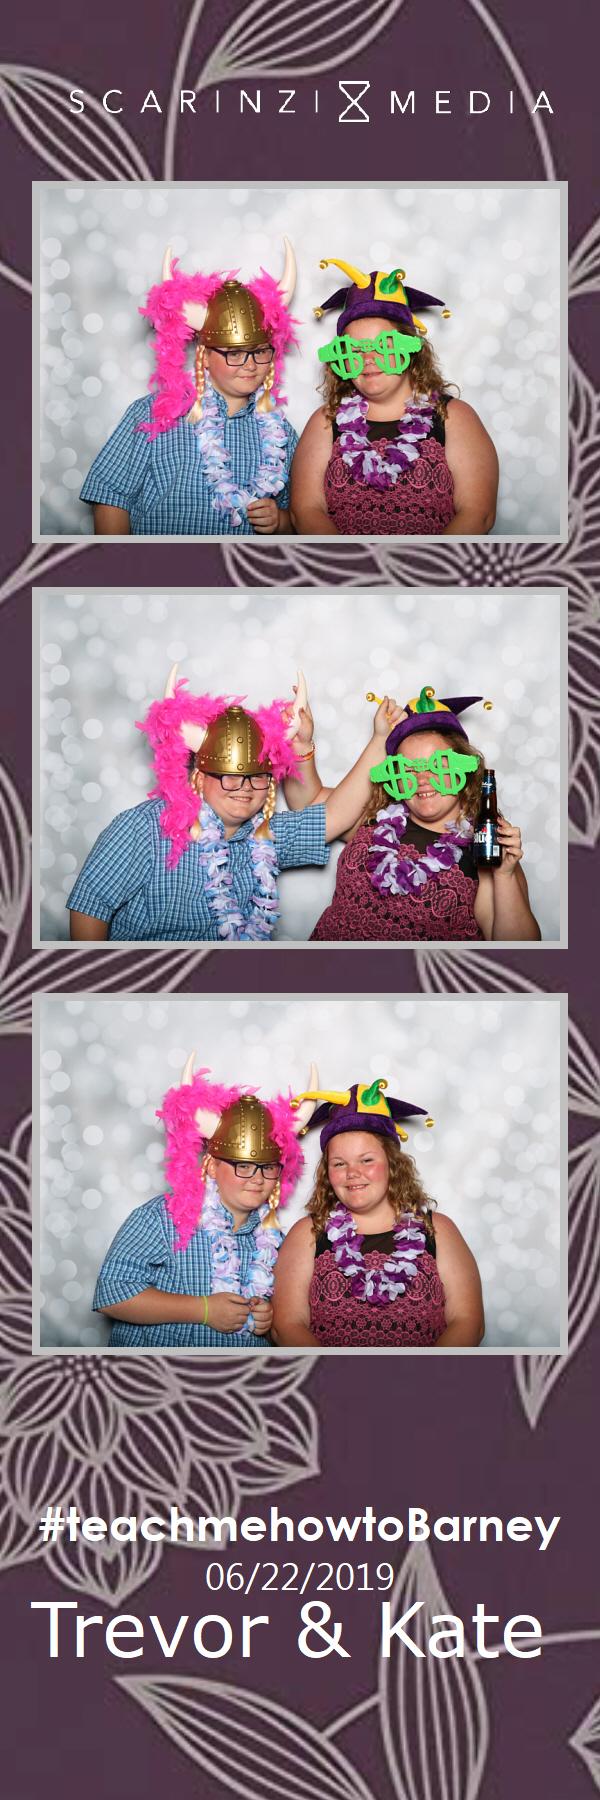 2019.06.22 - Barney Wedding PHOTOBOOTH55.jpg